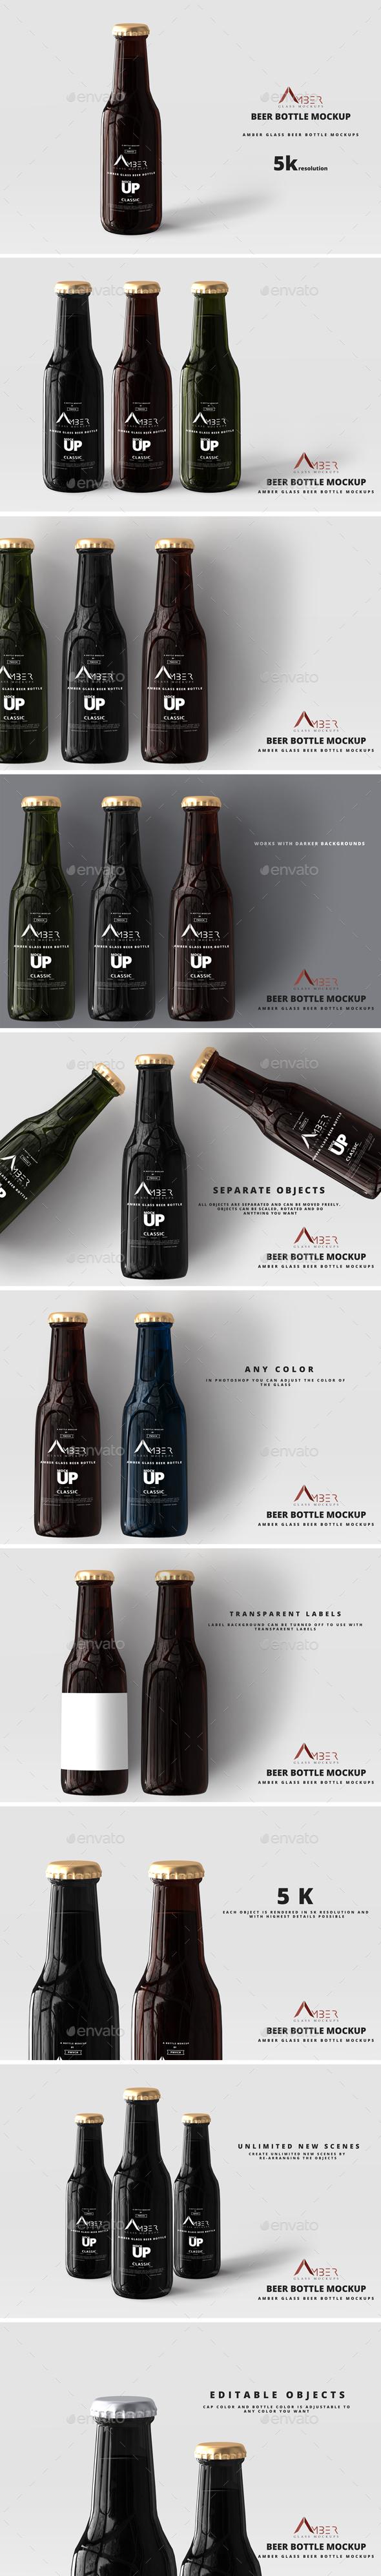 Amber Glass Beer Bottle Mockup 04 - Food and Drink Packaging